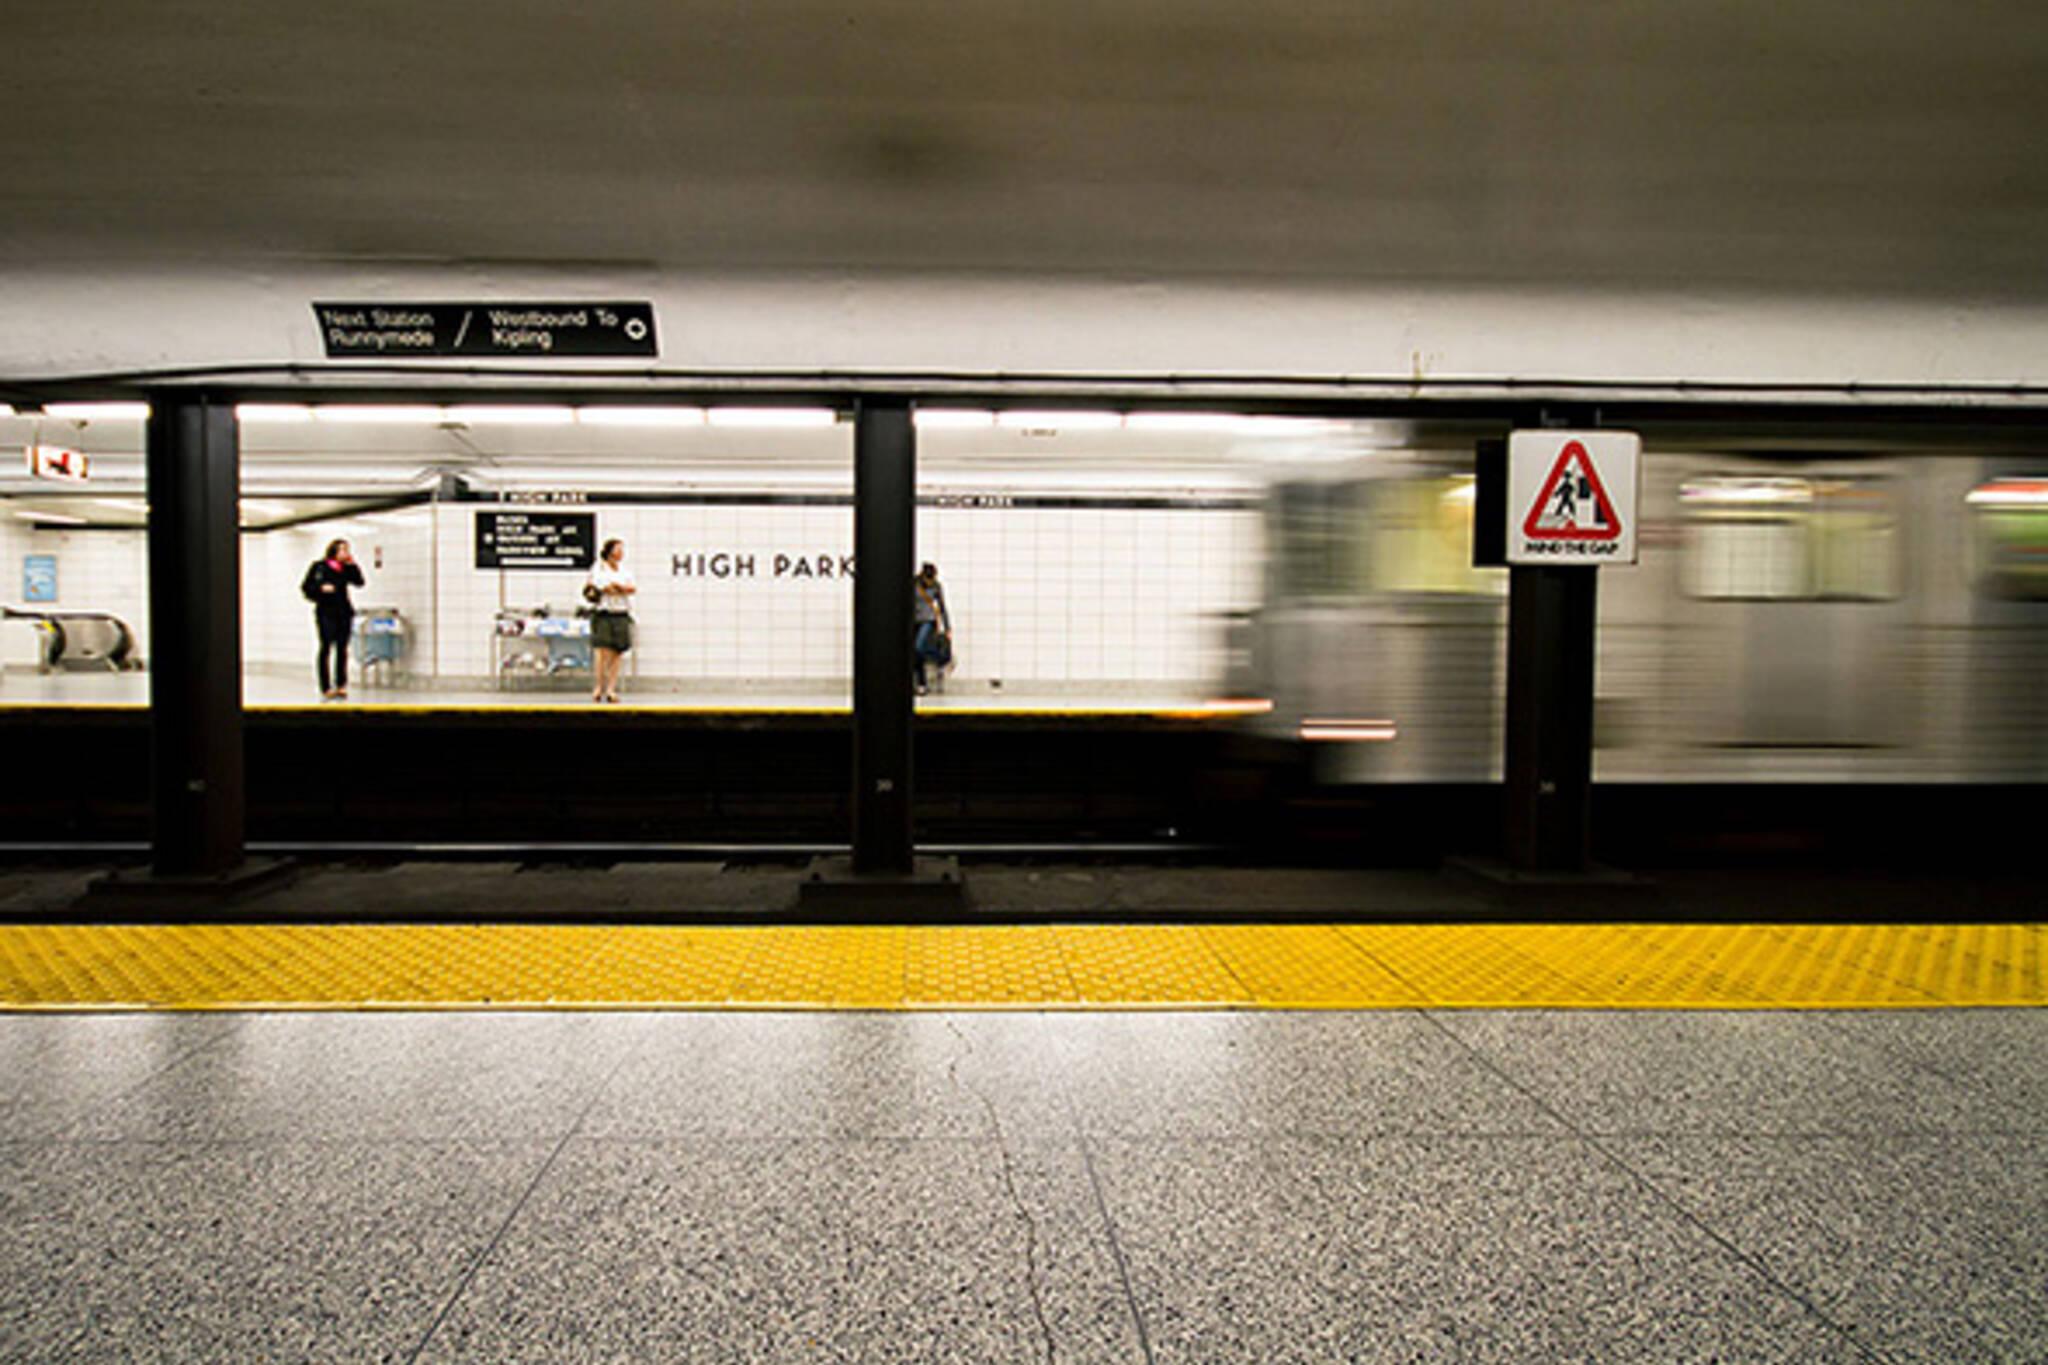 TTC Late Night subway service